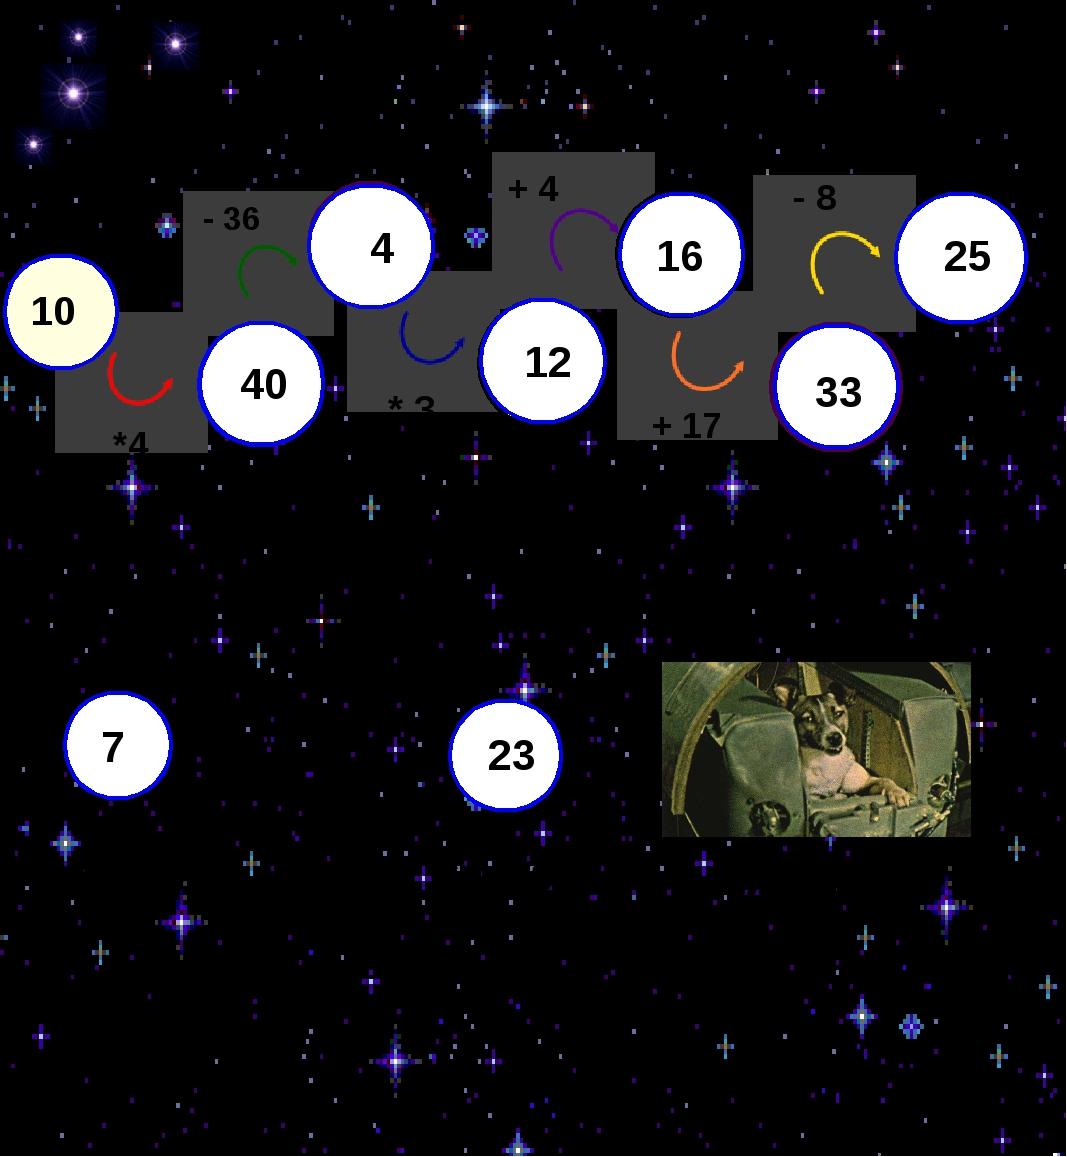 10 - 36 * 3 + 4 + 17 - 8 *4 40 4 12 16 33 25 7 33 25 Белка Стрелка Лайка 40...